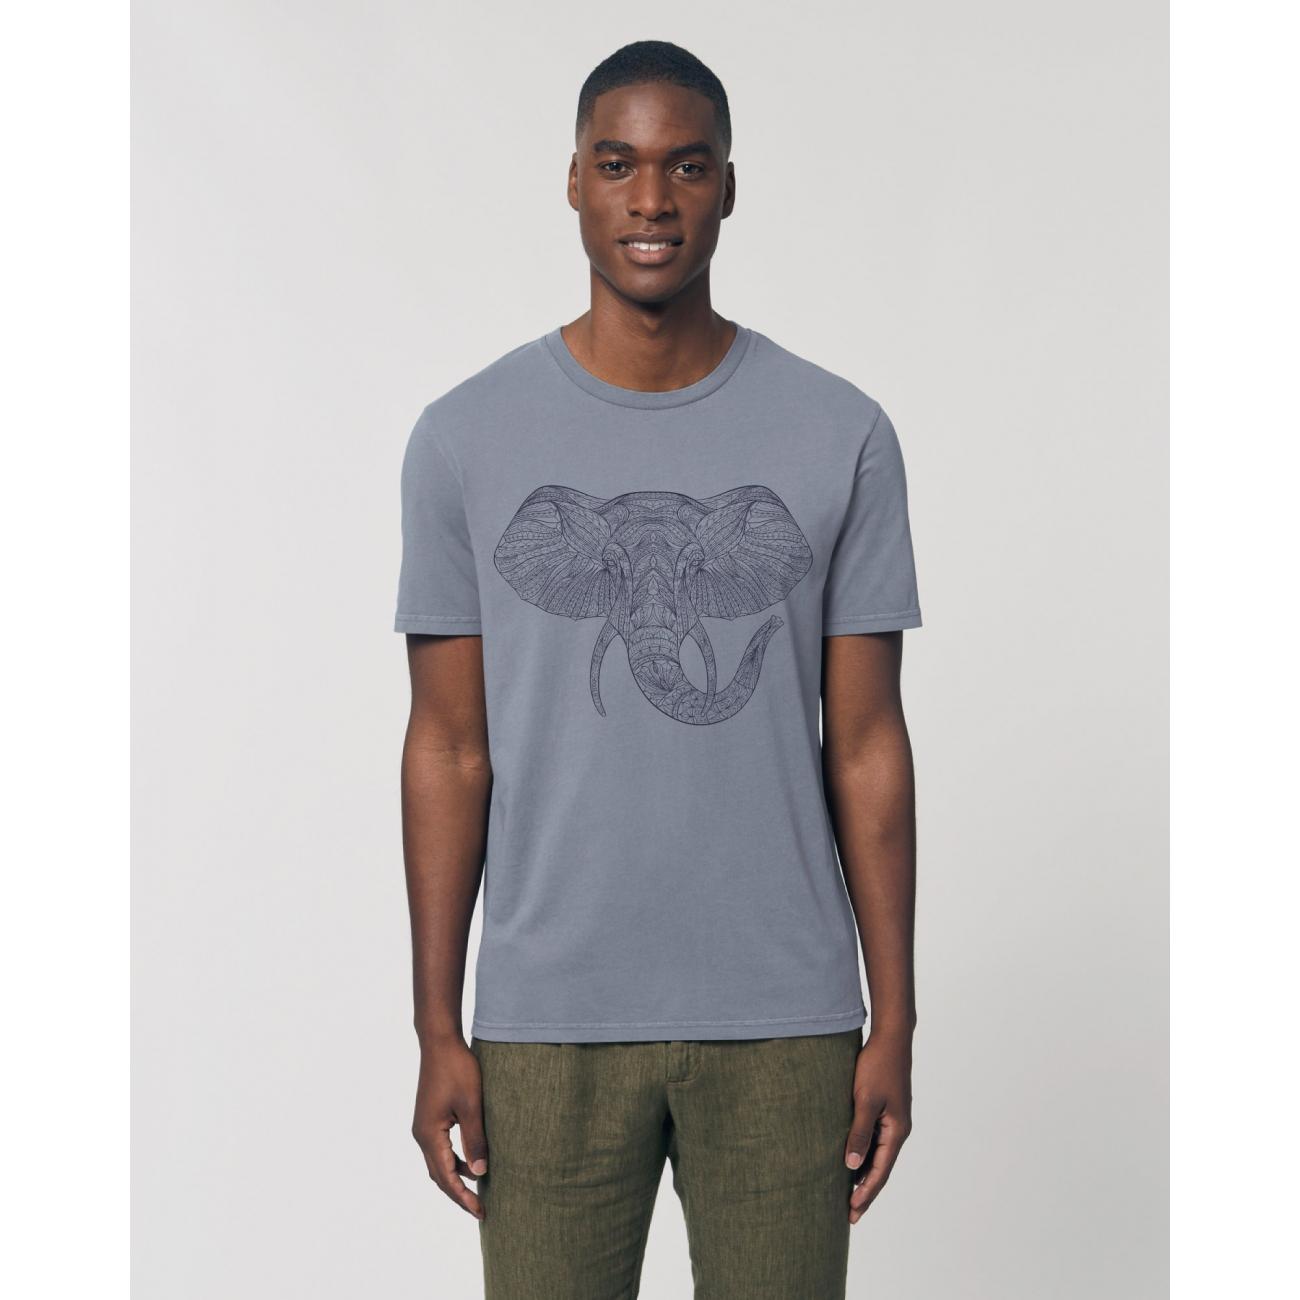 https://tee-shirt-bio.com/8909-thickbox_default/tee-shirt-gris-lavande-vintage-coton-bio-homme-impression-elephant.jpg